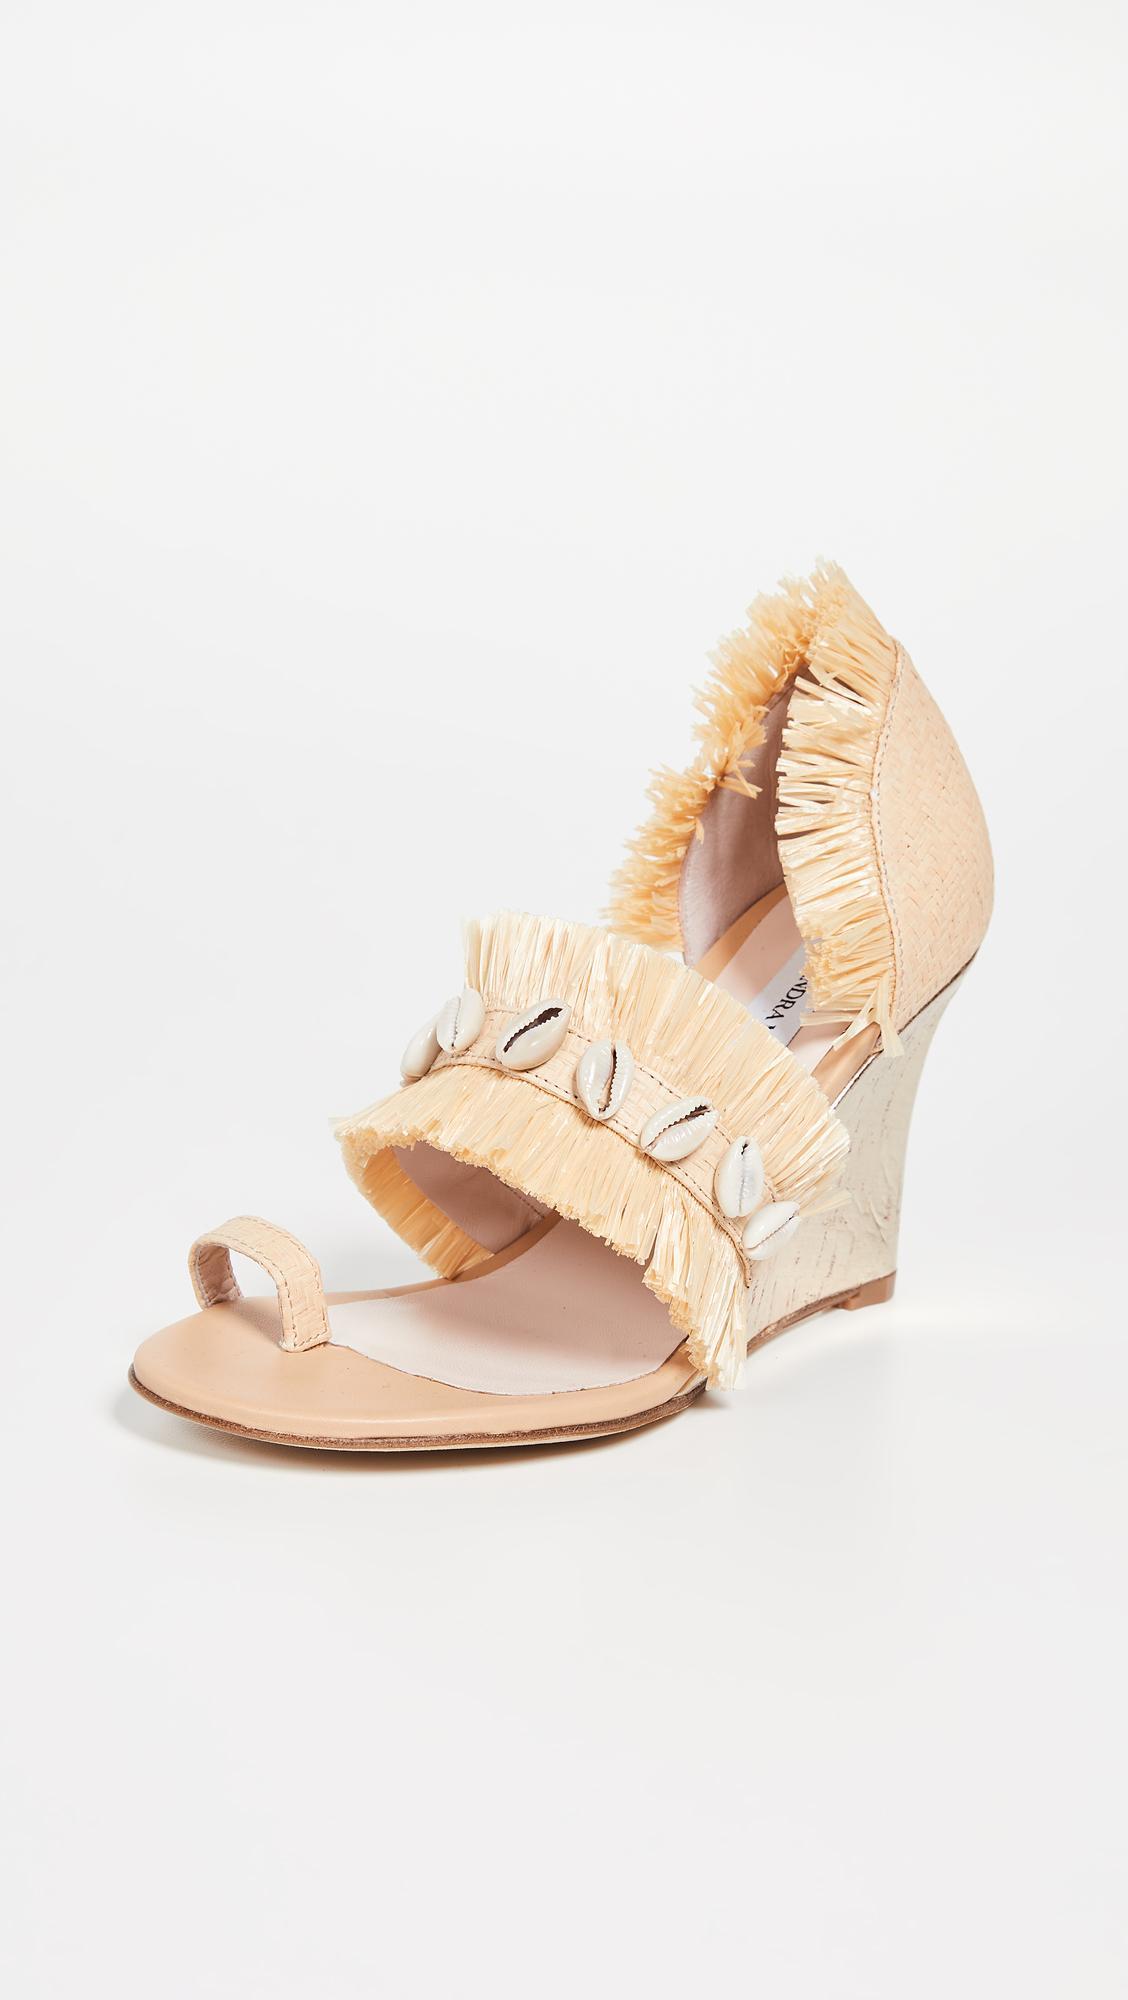 a51cf132c284 Lyst - LEANDRA MEDINE Raffia Fringe Wedge Sandals in Natural